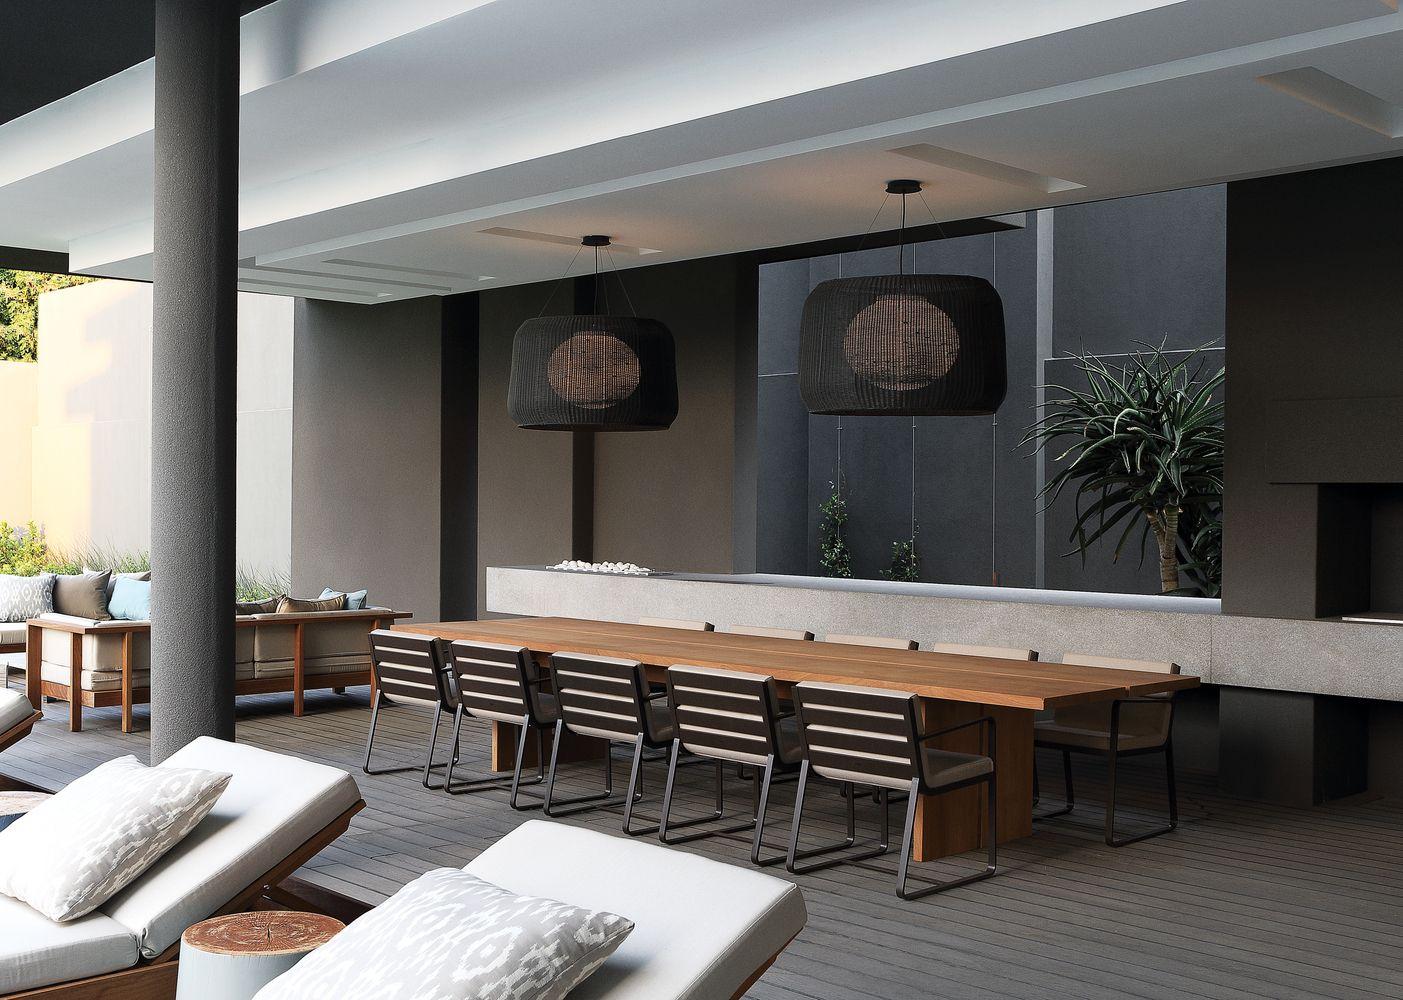 Gallery of Art House / ARRCC 17 Design, Modern house, Home